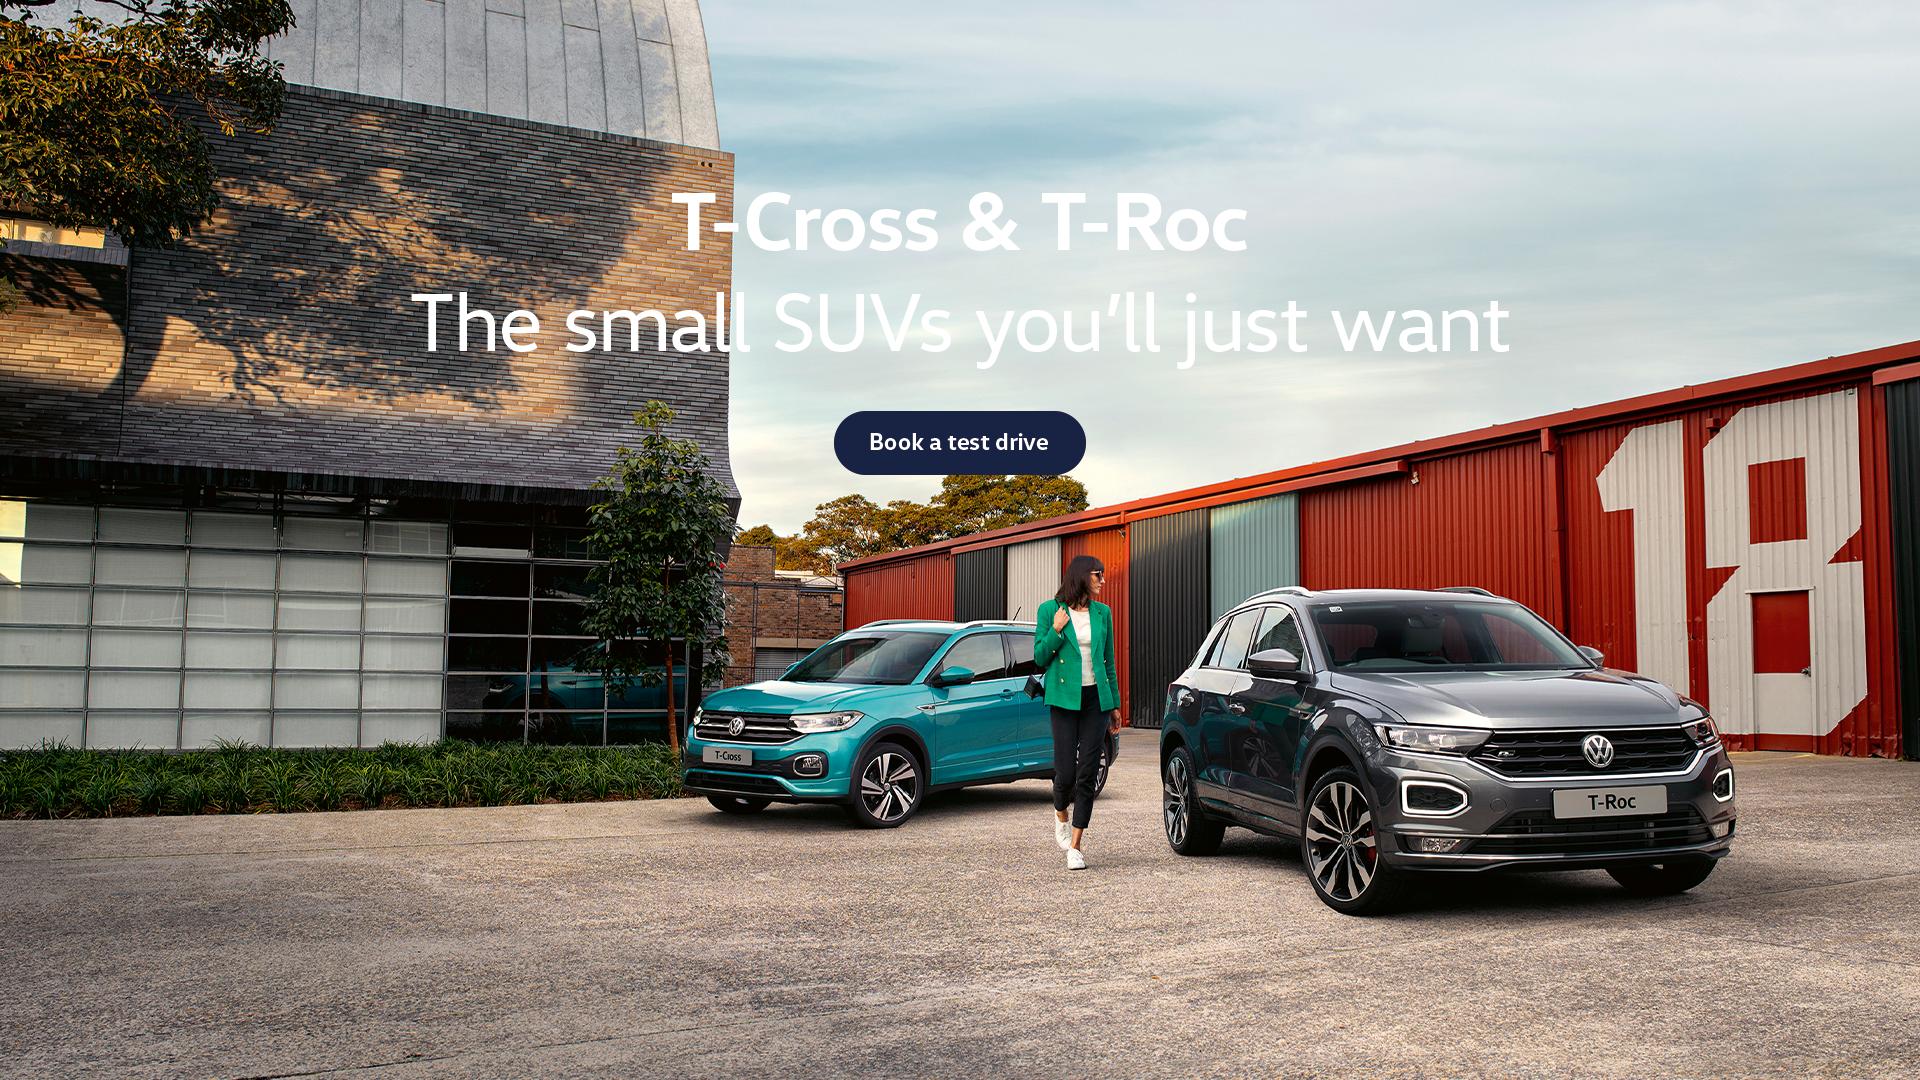 Volkswagen Small SUV range. Test drive today at Robina Volkswagen